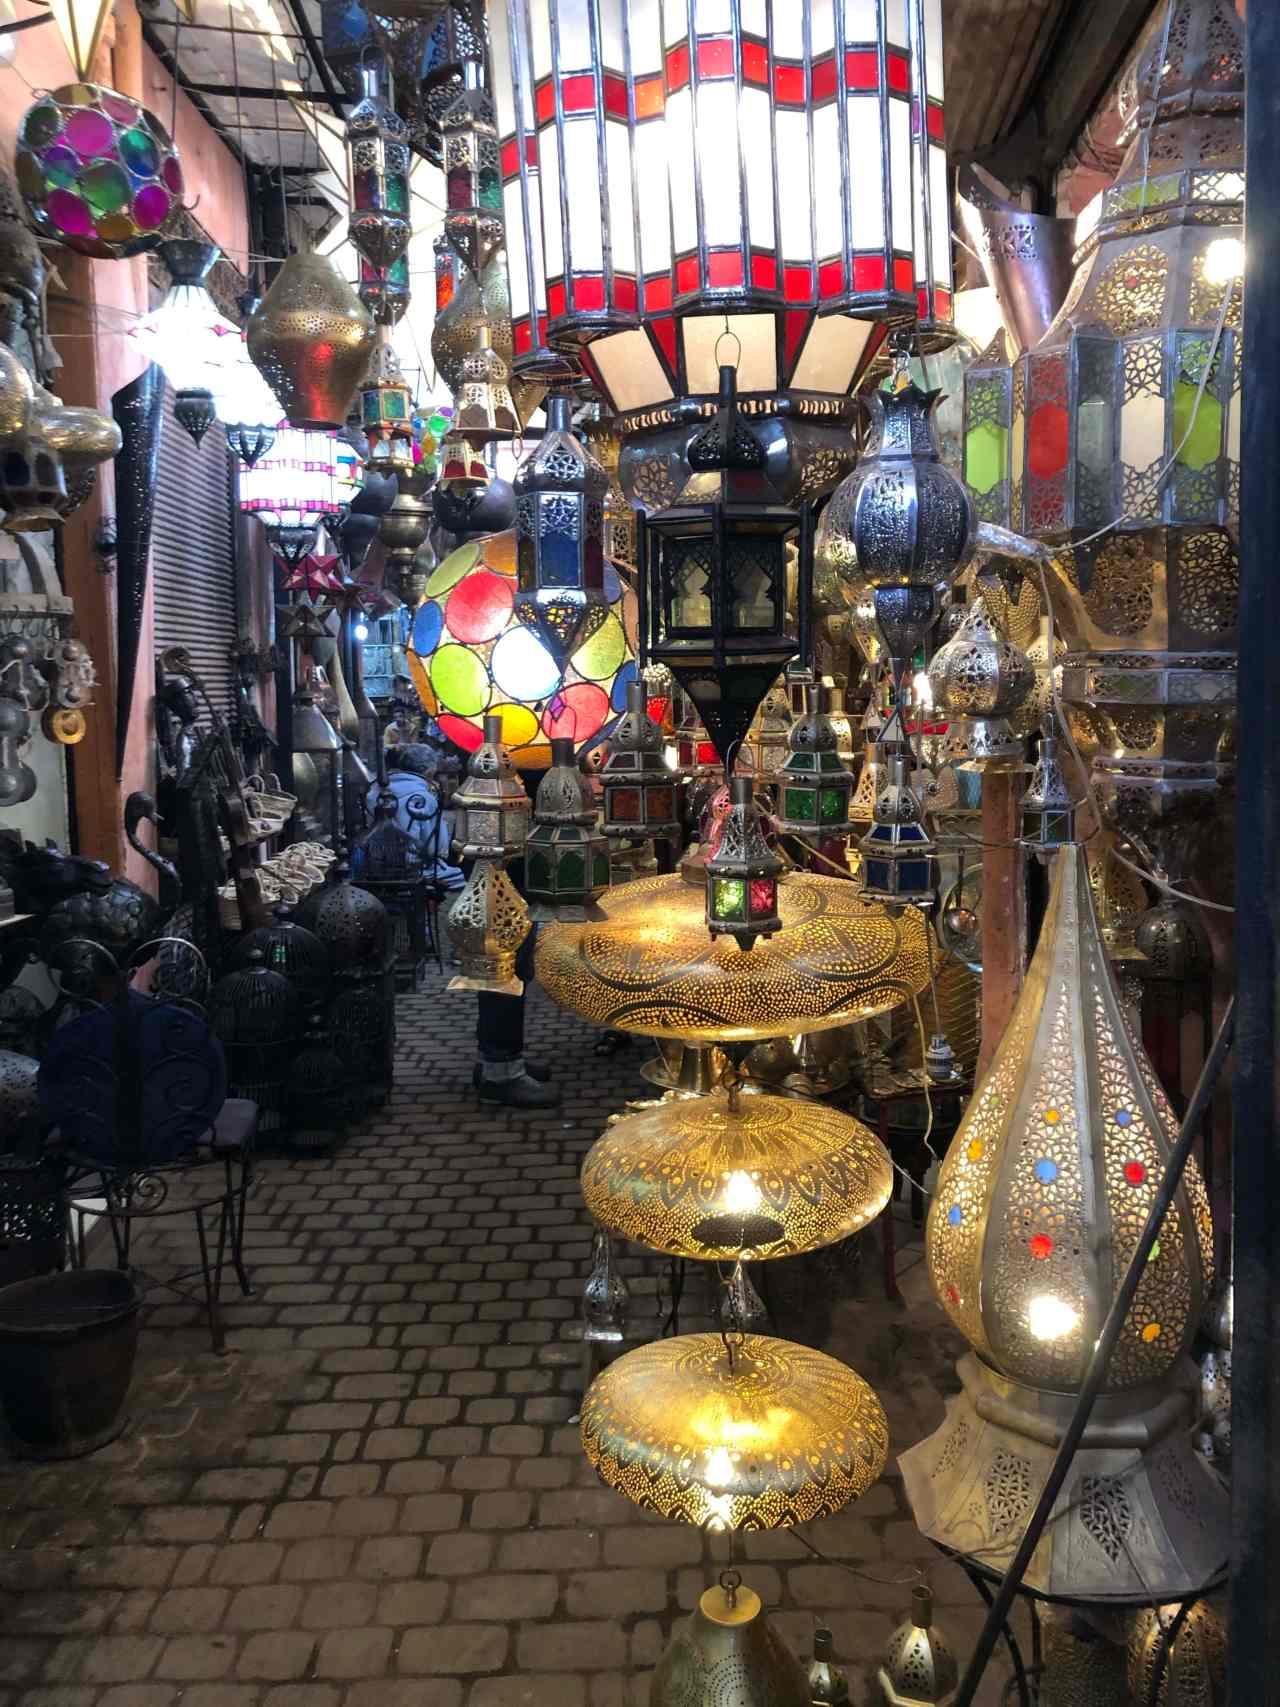 Moroccan lanterns in the Marrakech souks